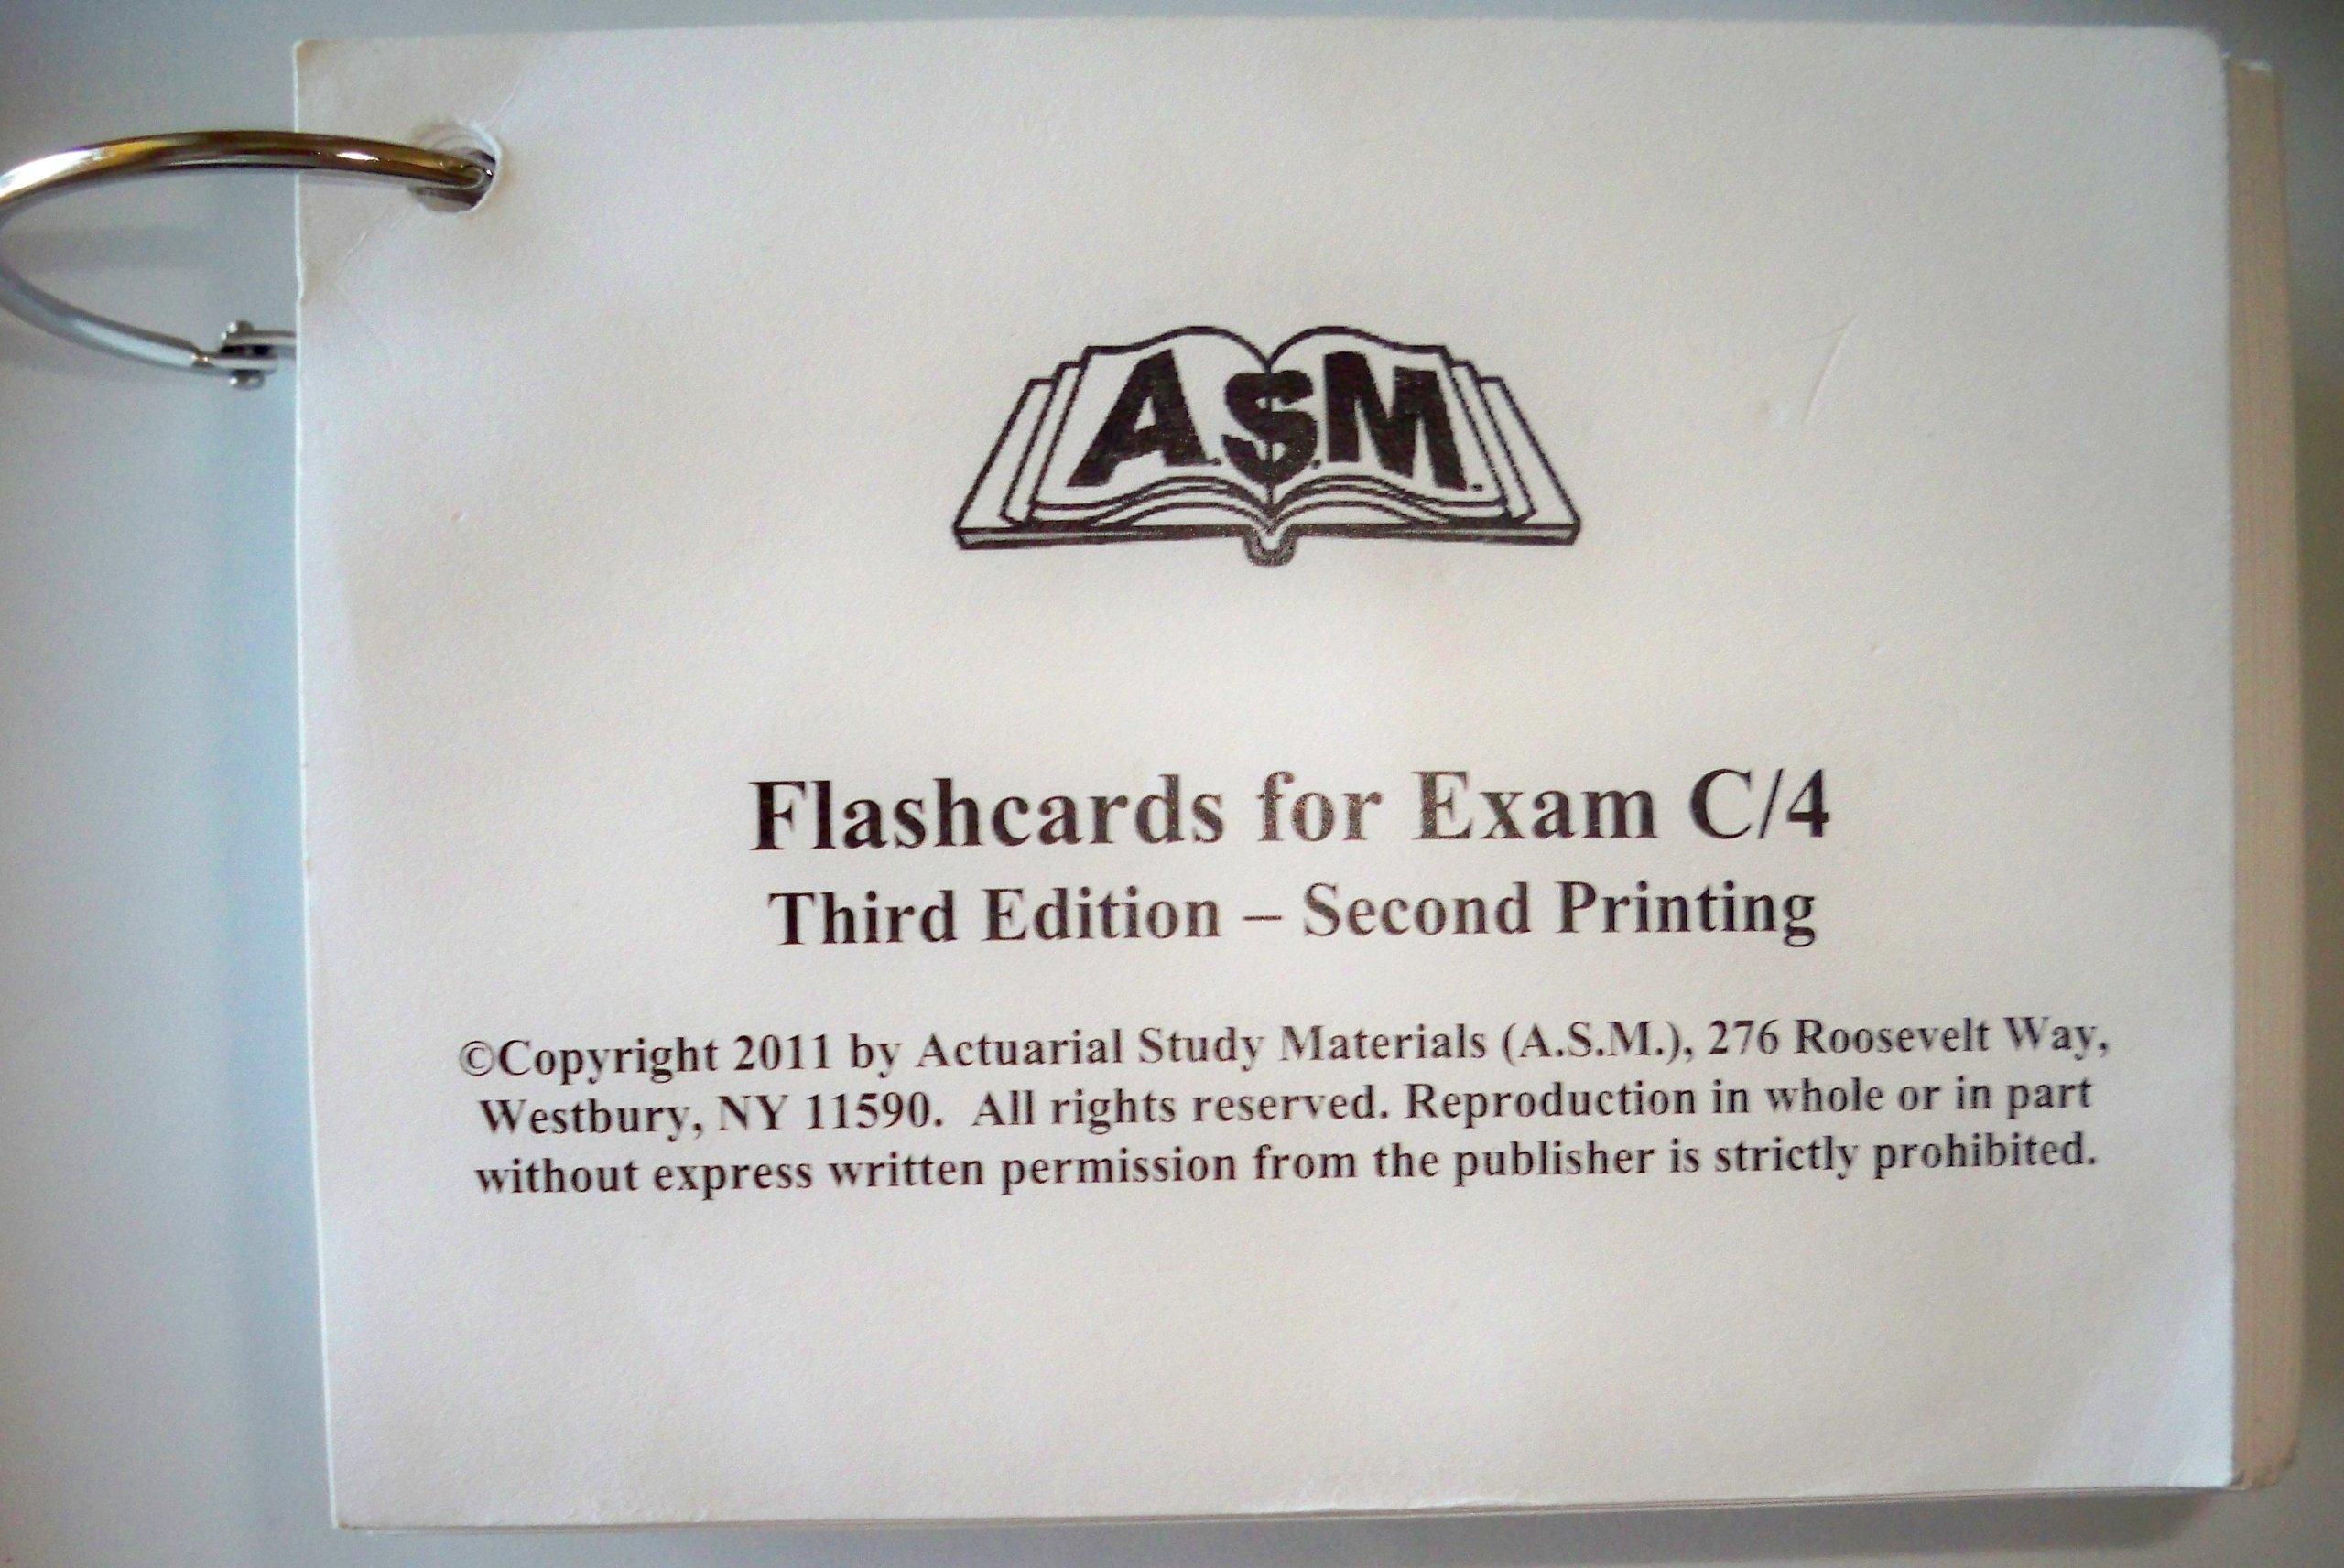 ASM Flashcards for Exam C/4: Actuarial Study Materials (ASM): Amazon.com:  Books